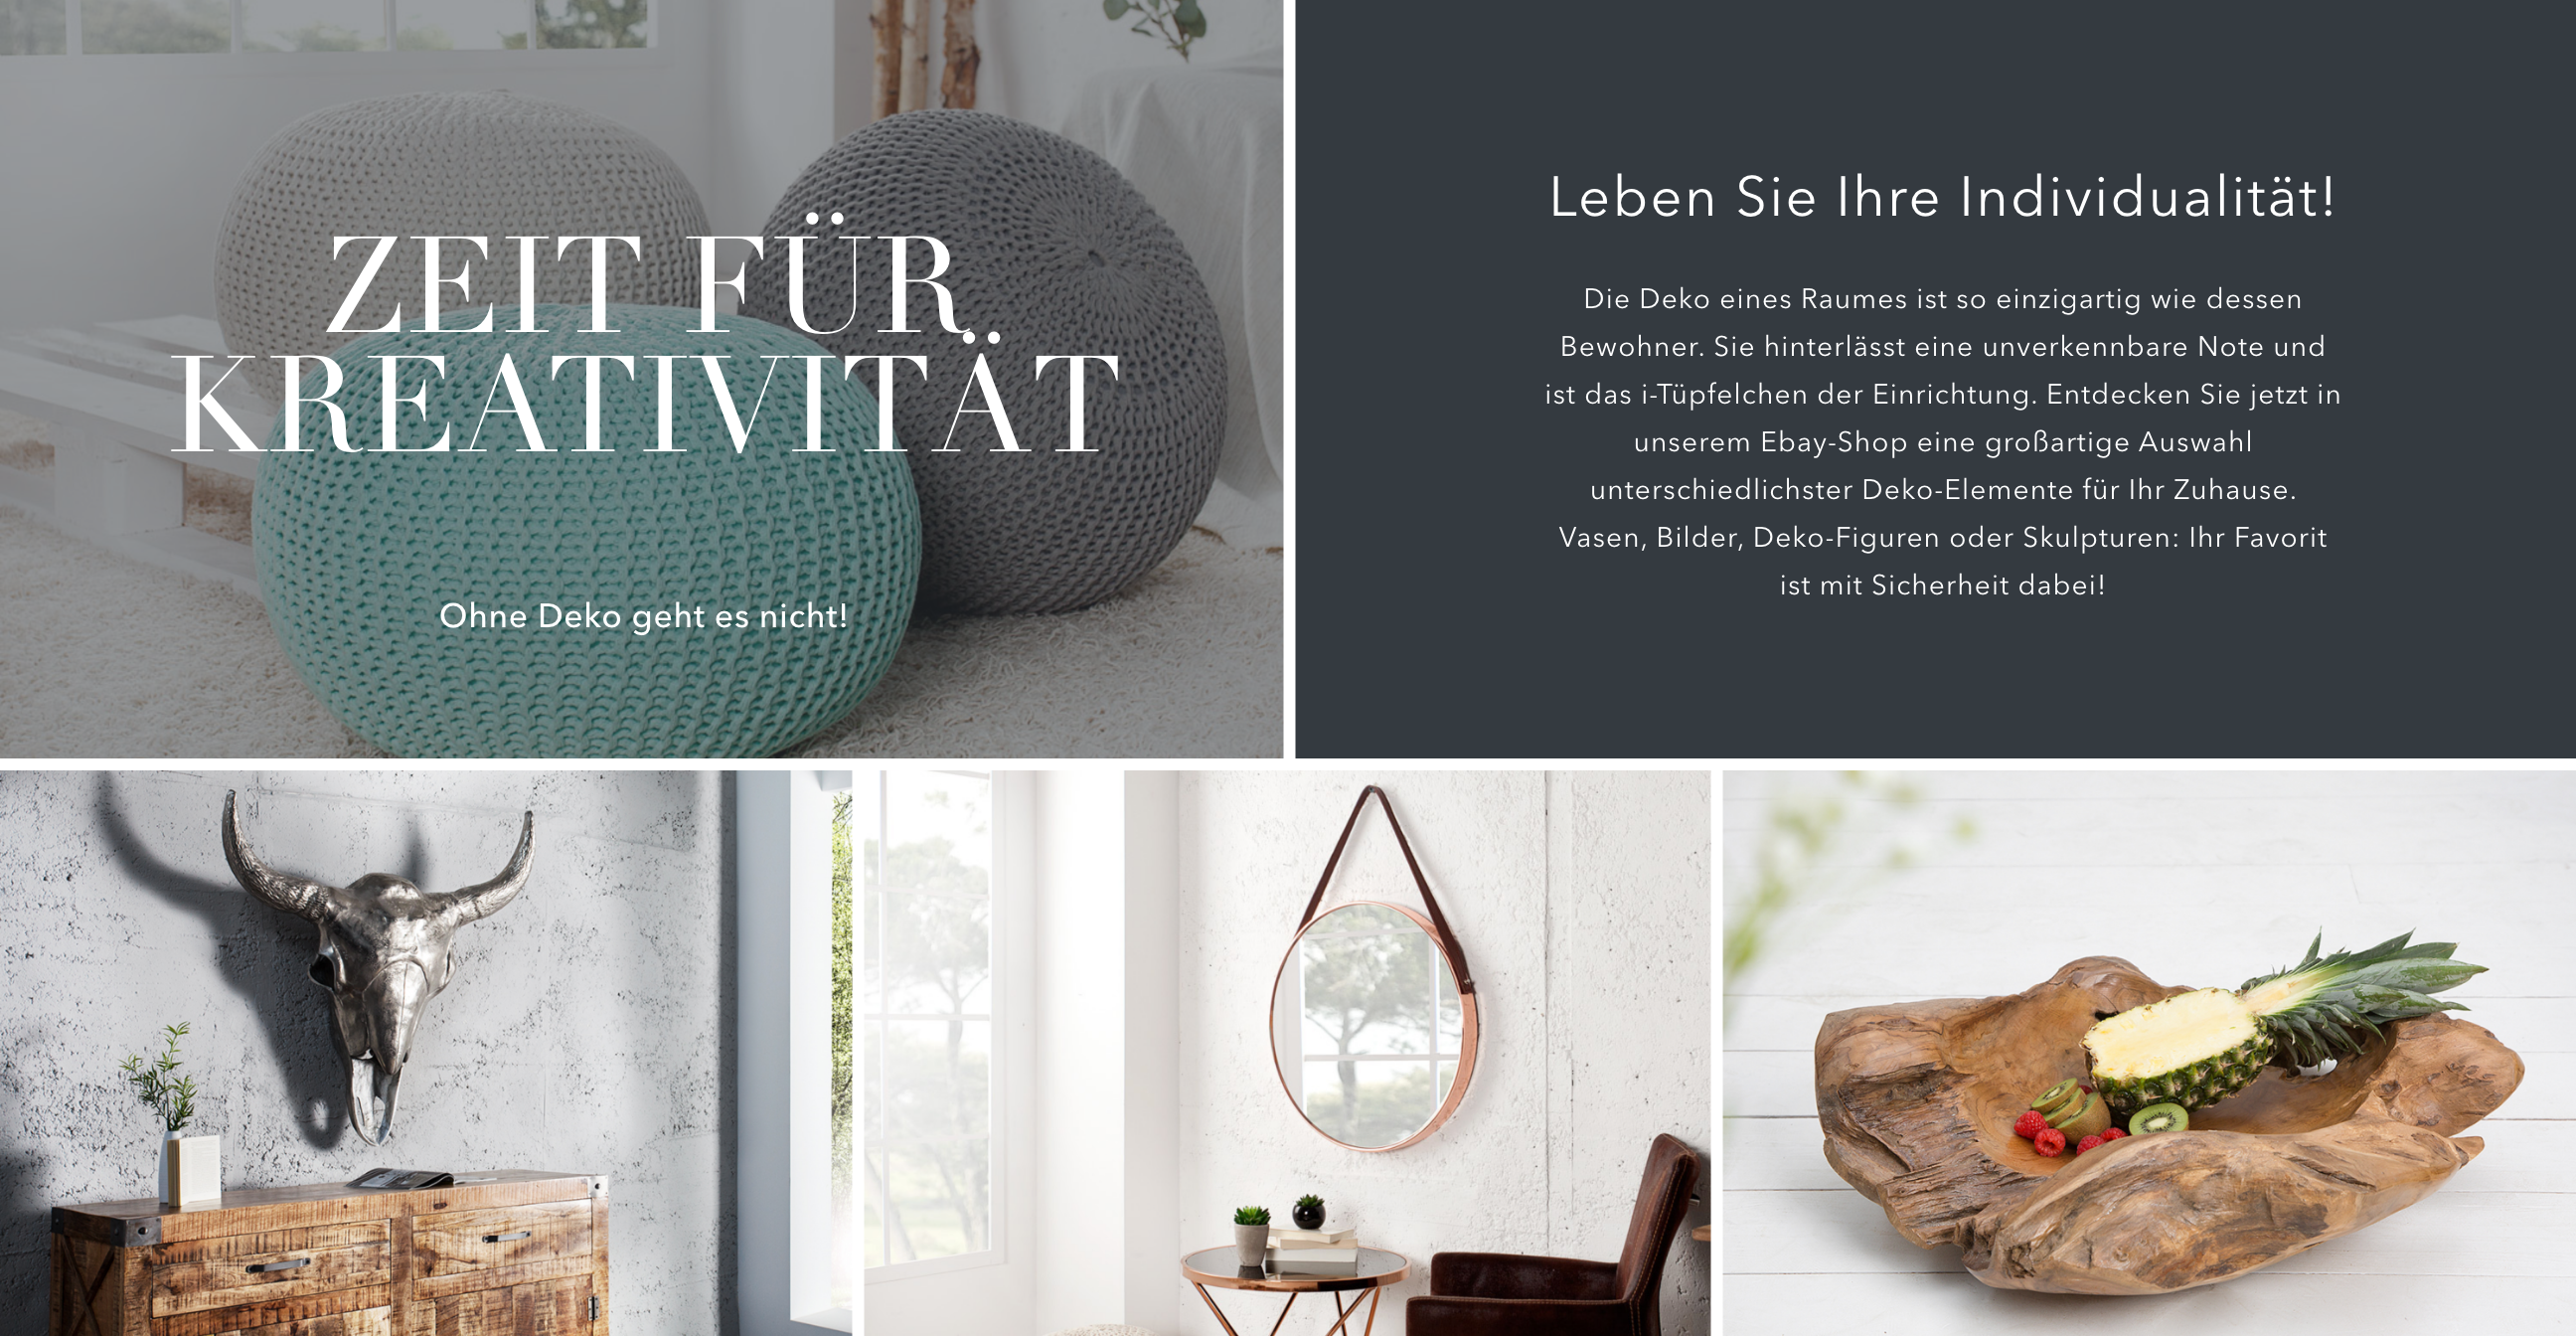 design pouf filz 50cm hellgrau wollbezug sitzhocker sitzpouf fu hocker hocker ebay. Black Bedroom Furniture Sets. Home Design Ideas